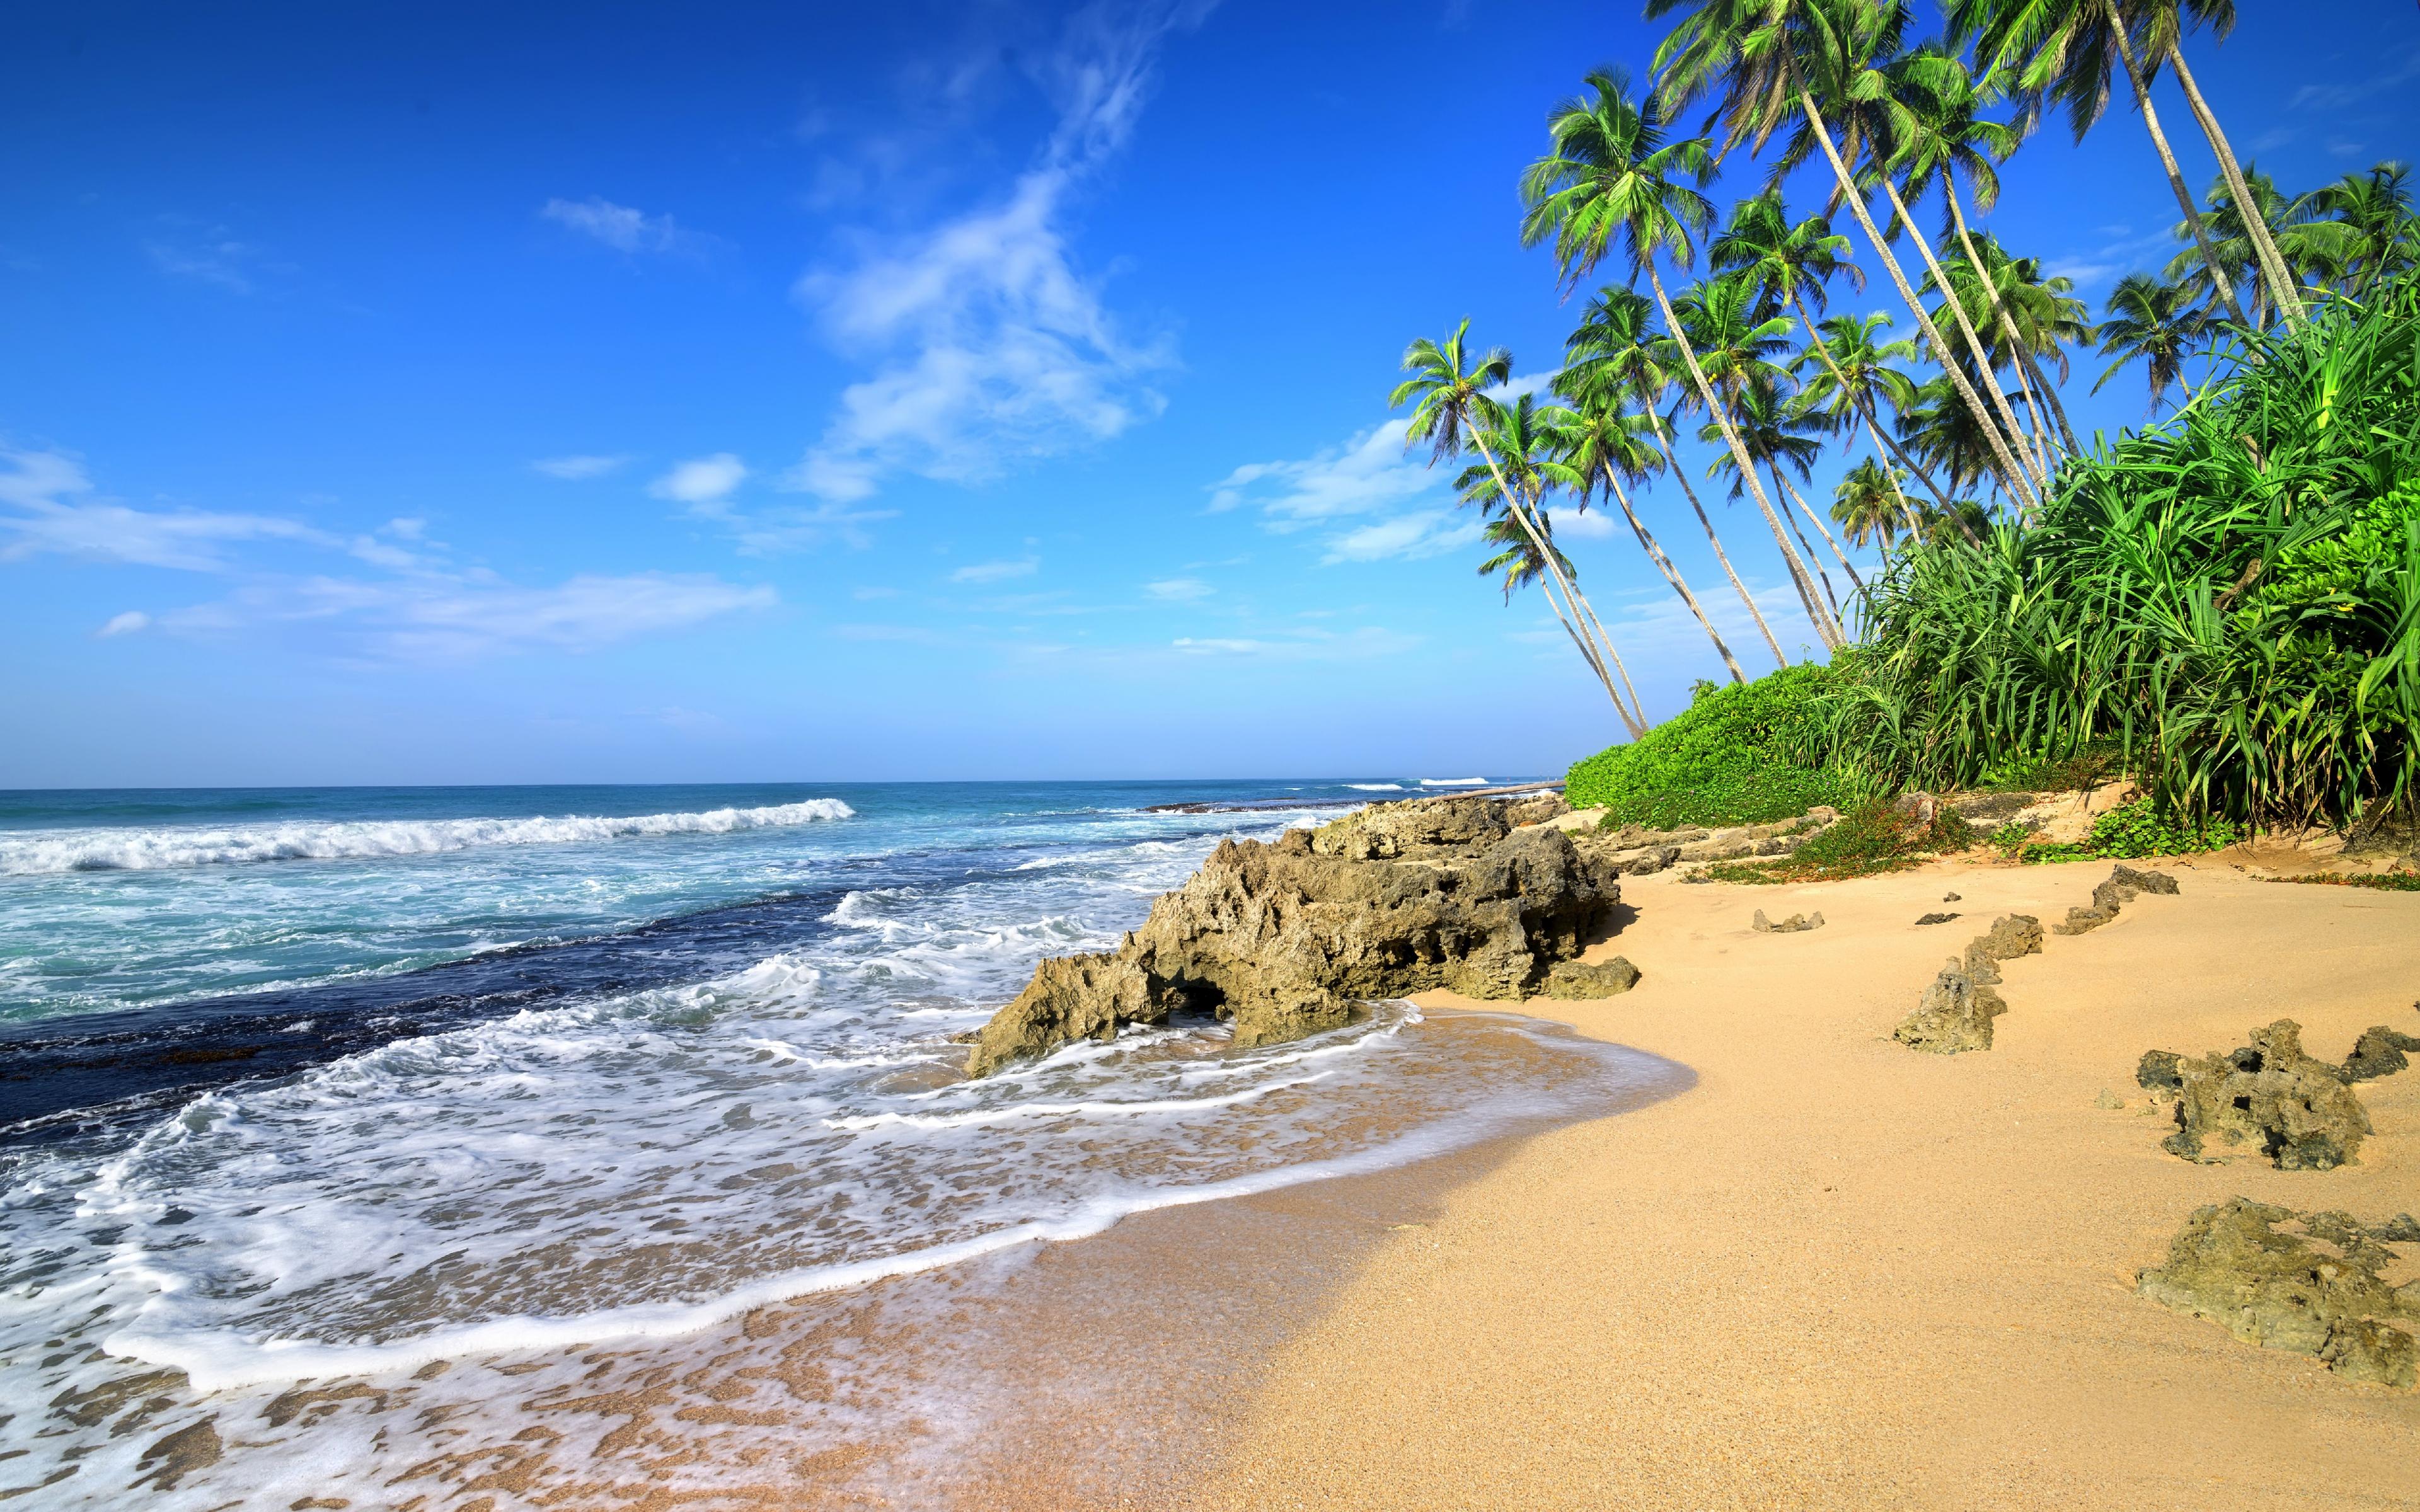 Download 3840x2400 wallpaper beach, sea waves, tropical ...